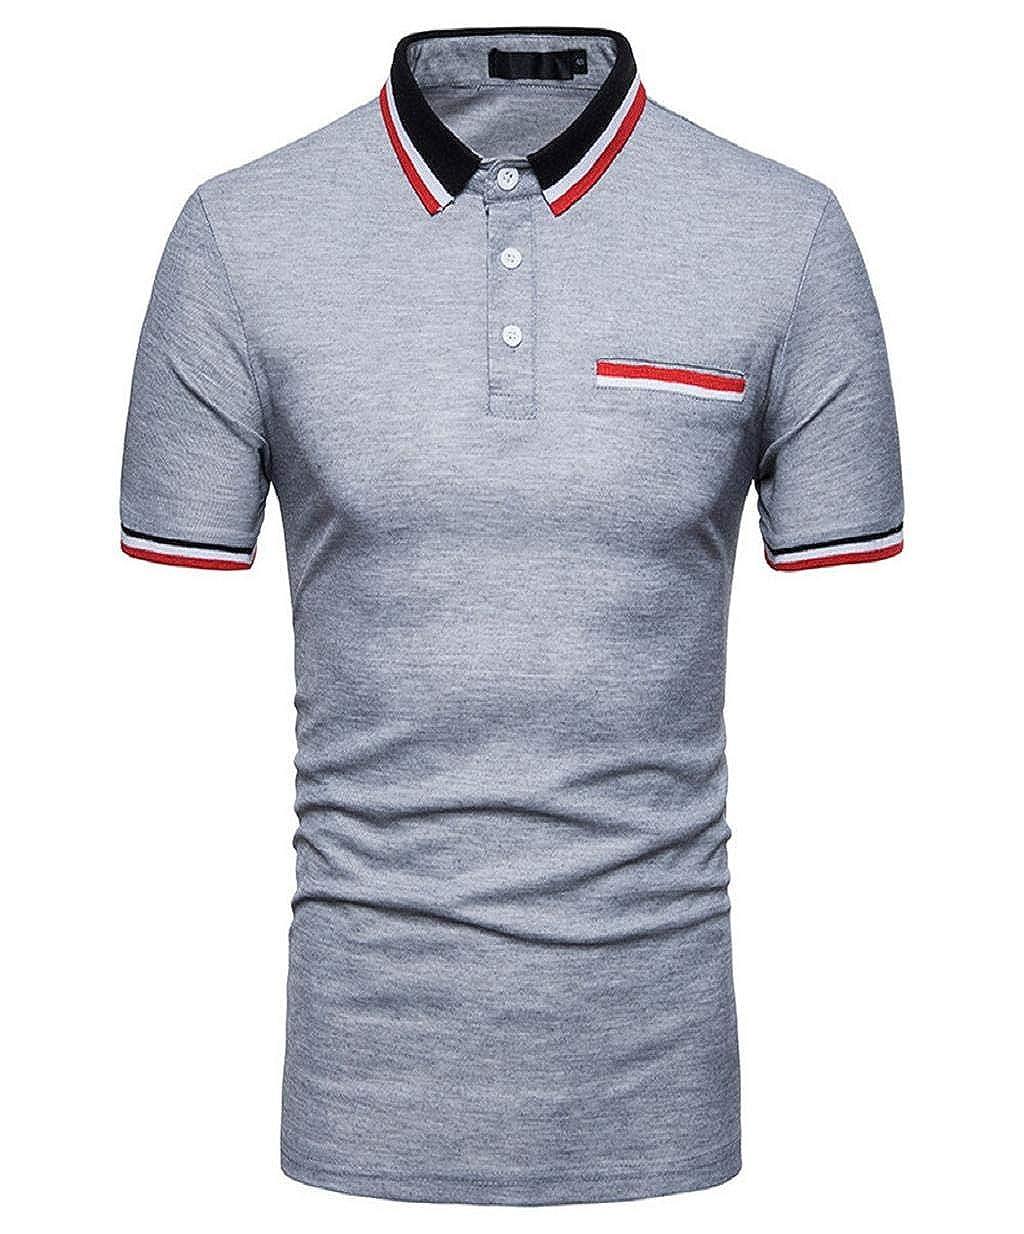 Camisas Polo Camisas para Hombre Manga Corta Jersey con Cuello ...